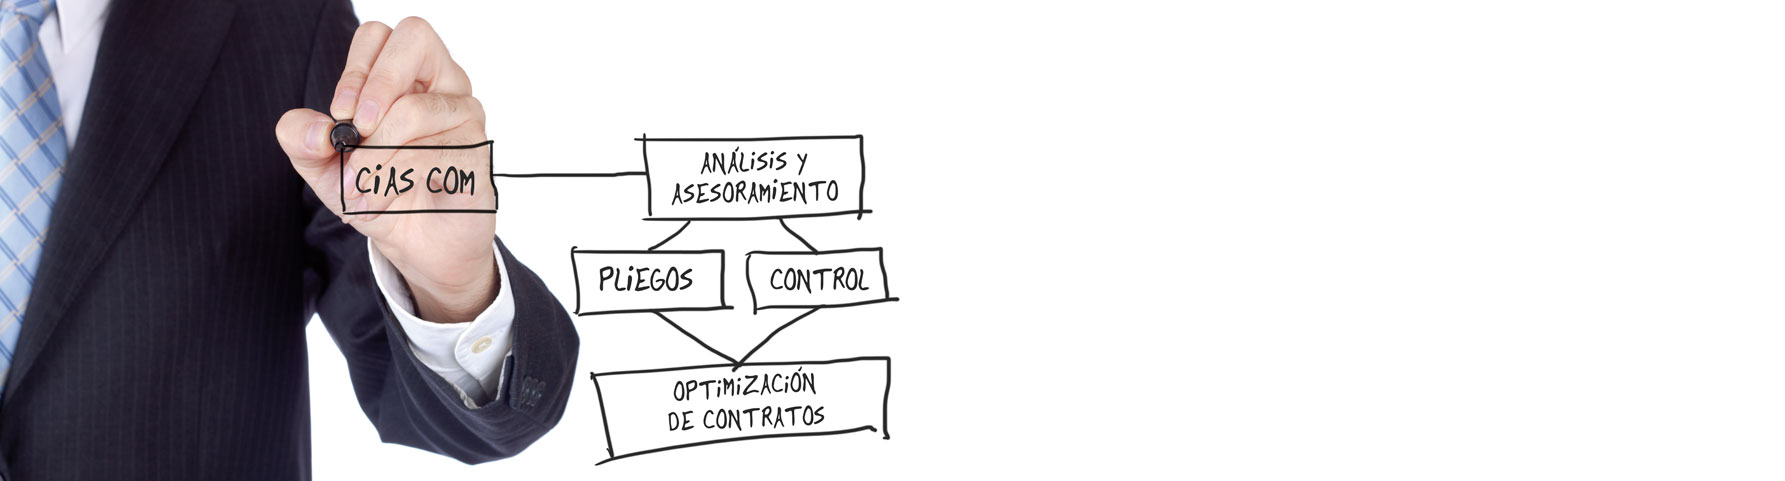 imagen-optimice-cotratacion